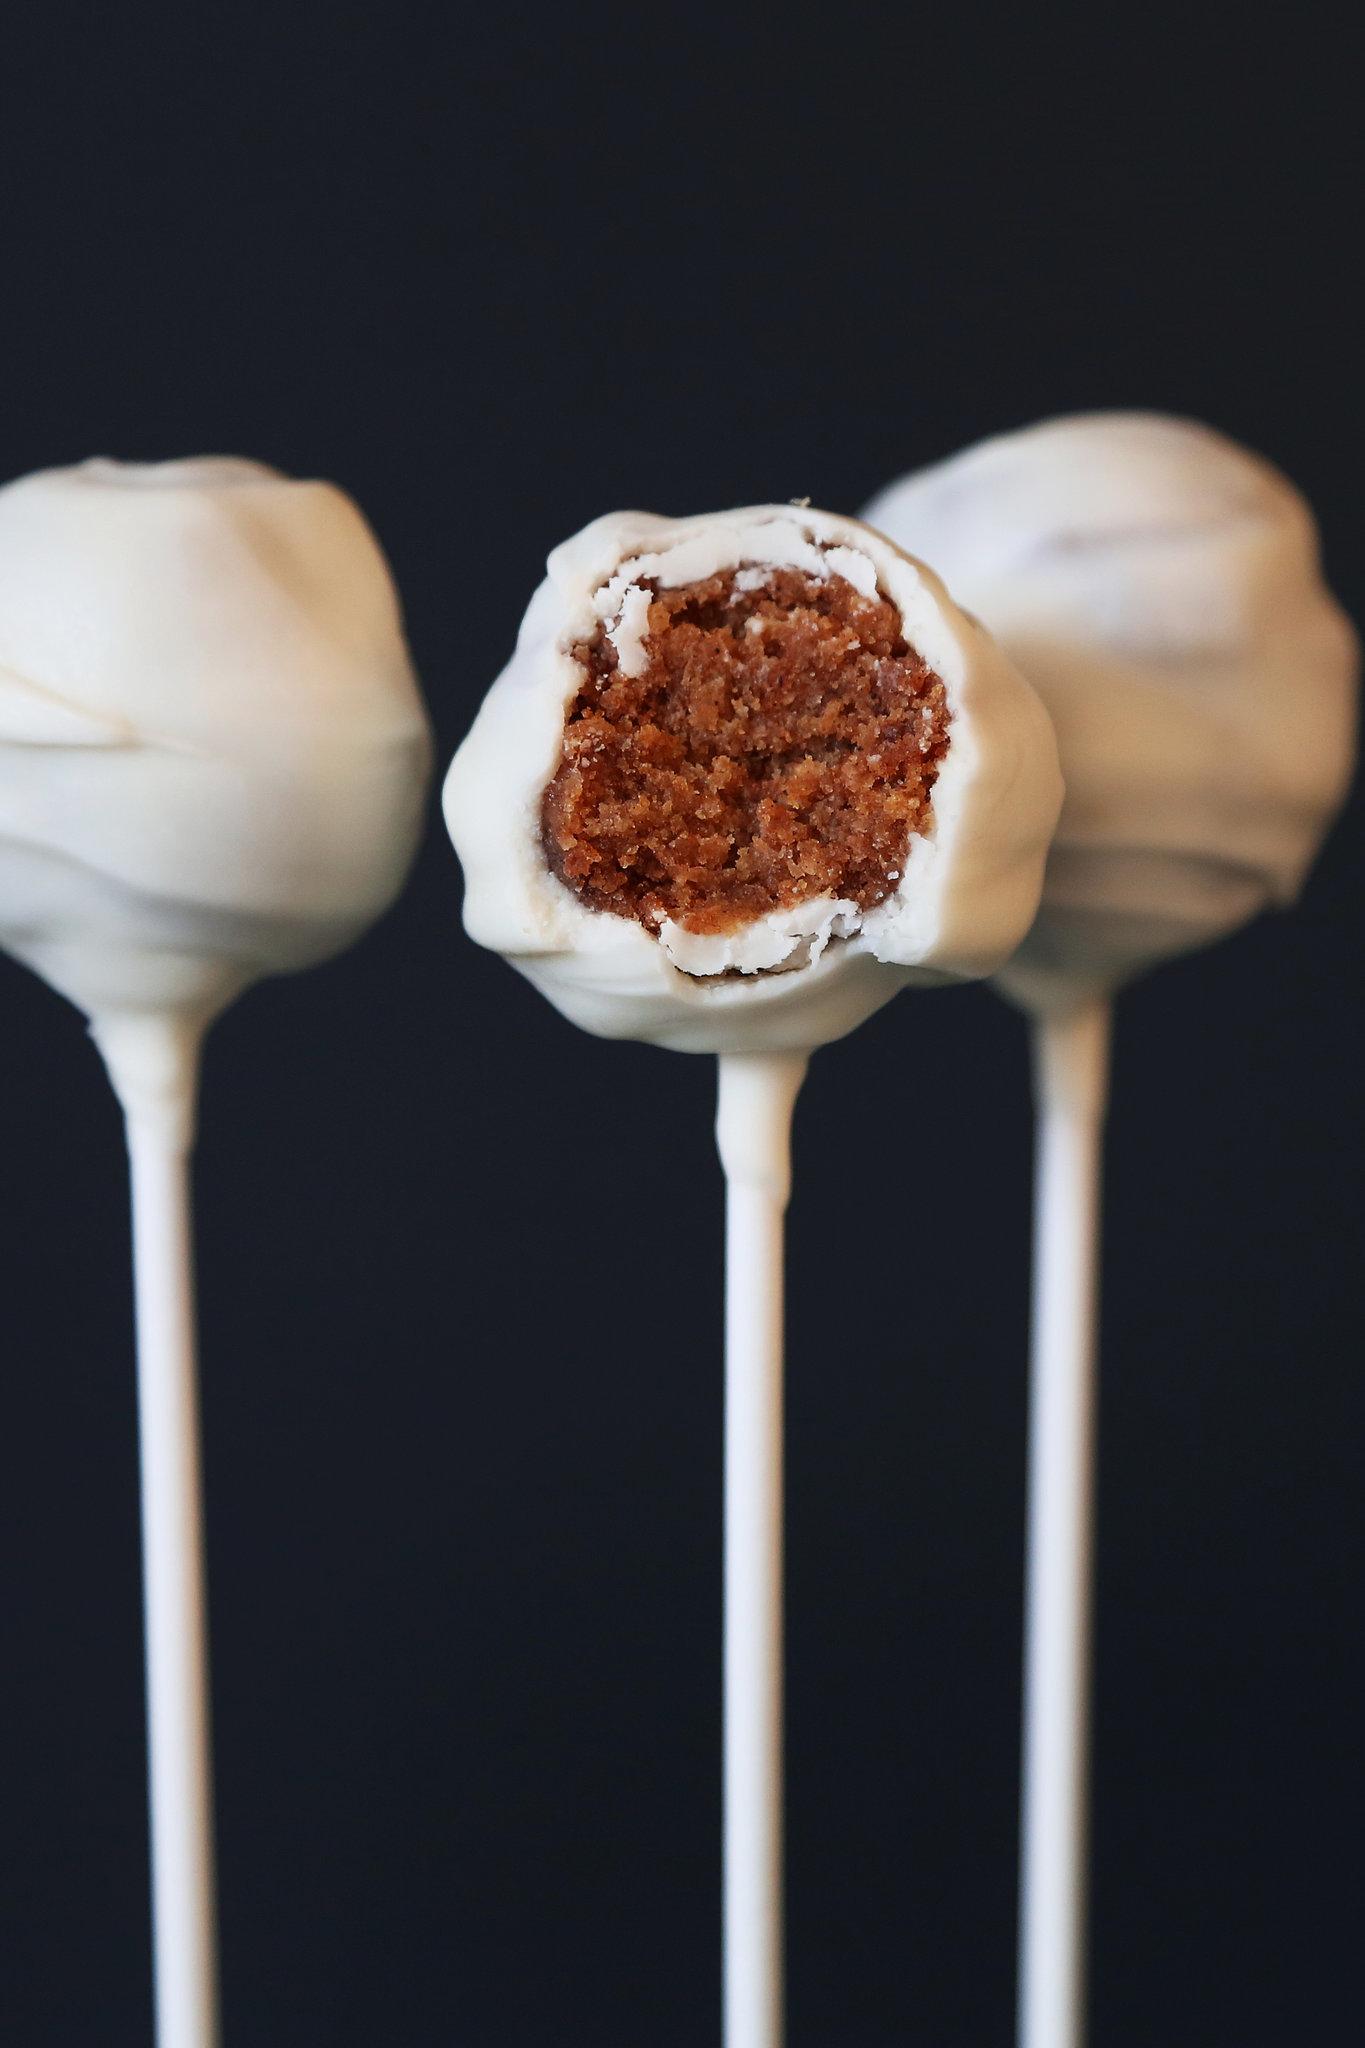 Cake Pops Recipe Images : Pumpkin Cake Pops Recipe POPSUGAR Food